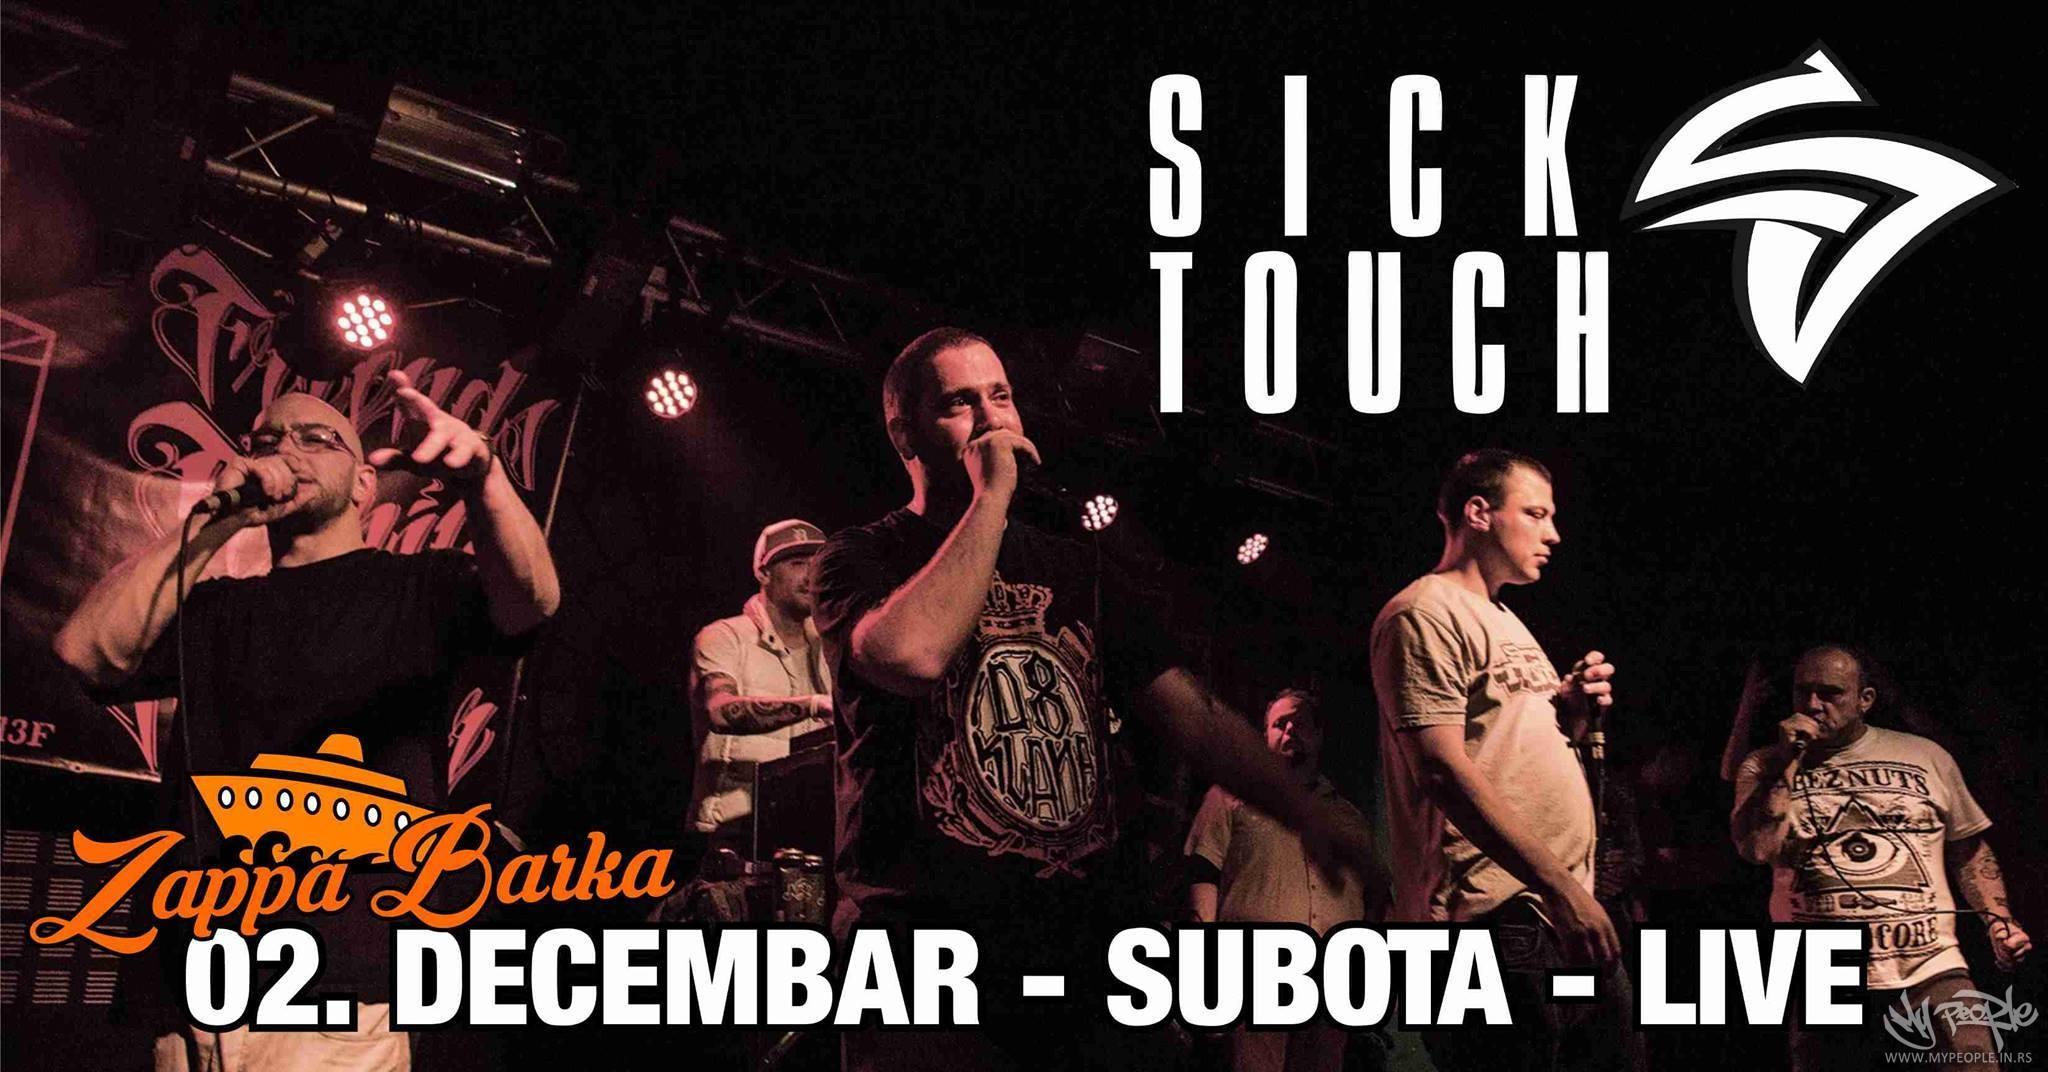 Sick Touch - LIVE @ Zappa Barka